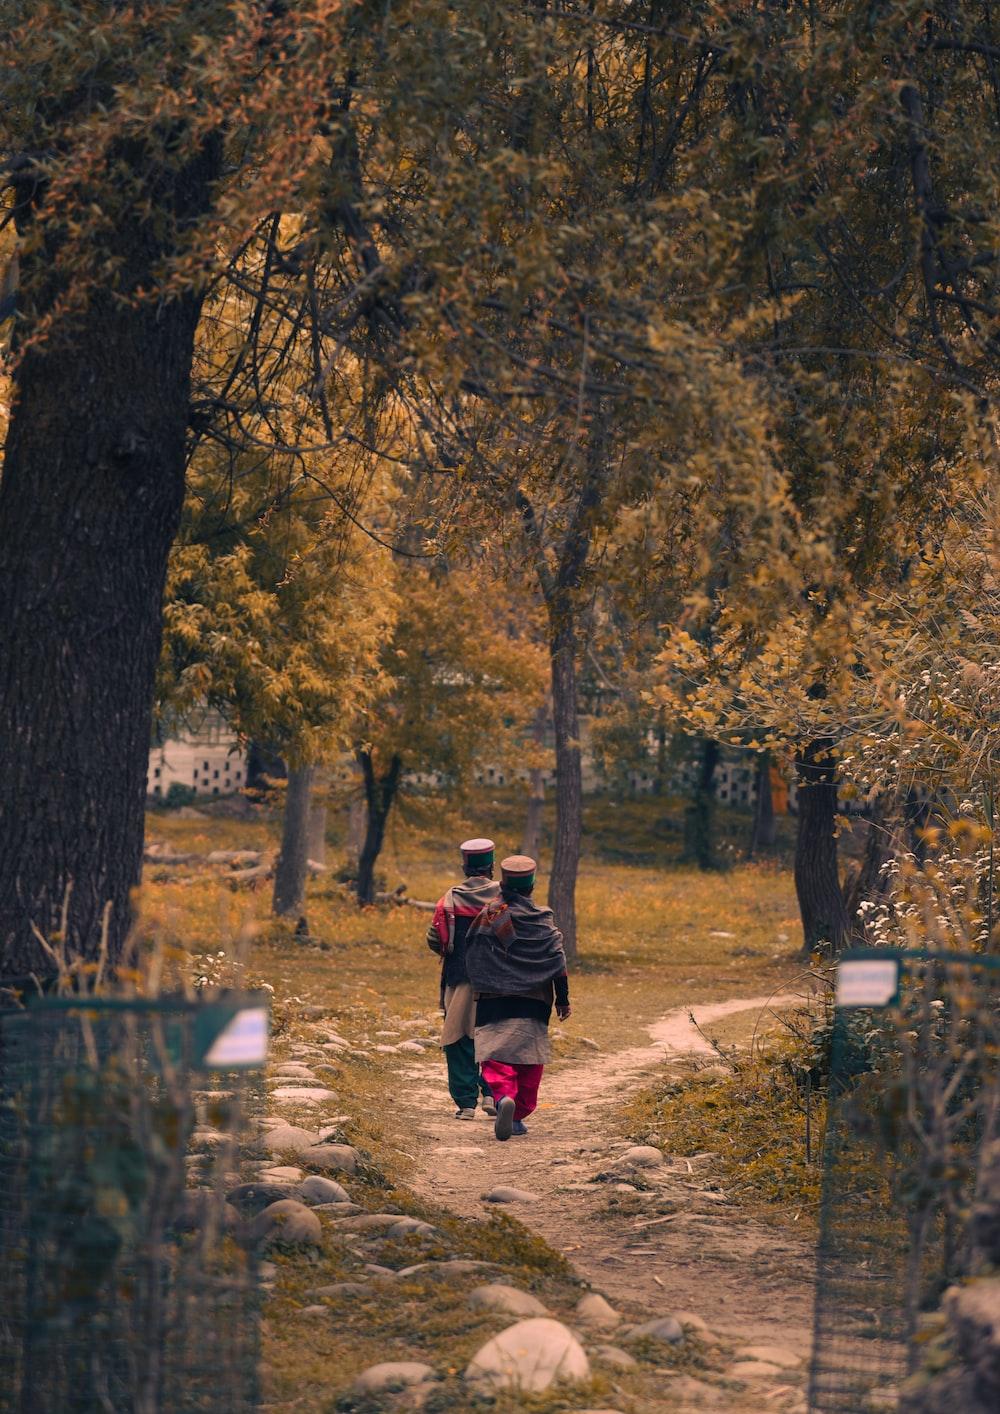 man in brown jacket and black pants walking on pathway